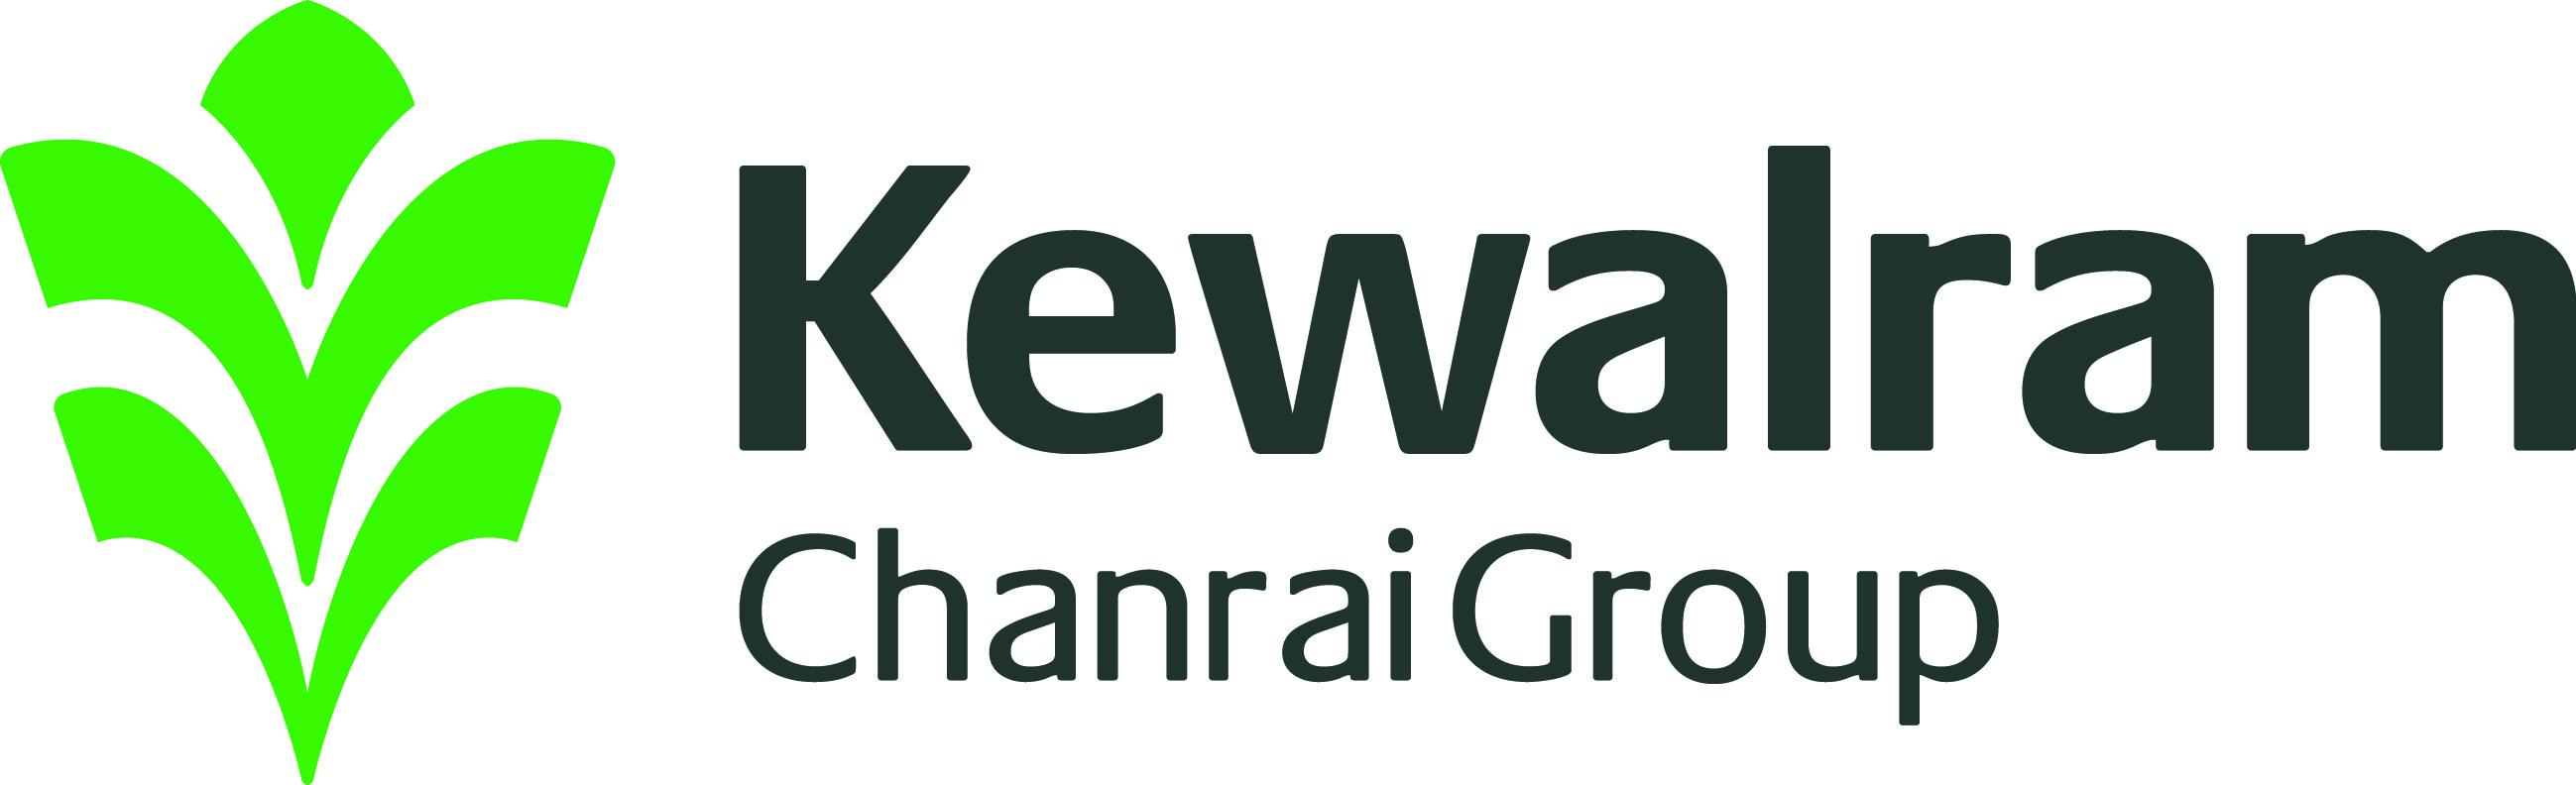 Kewalram Chanrai Group